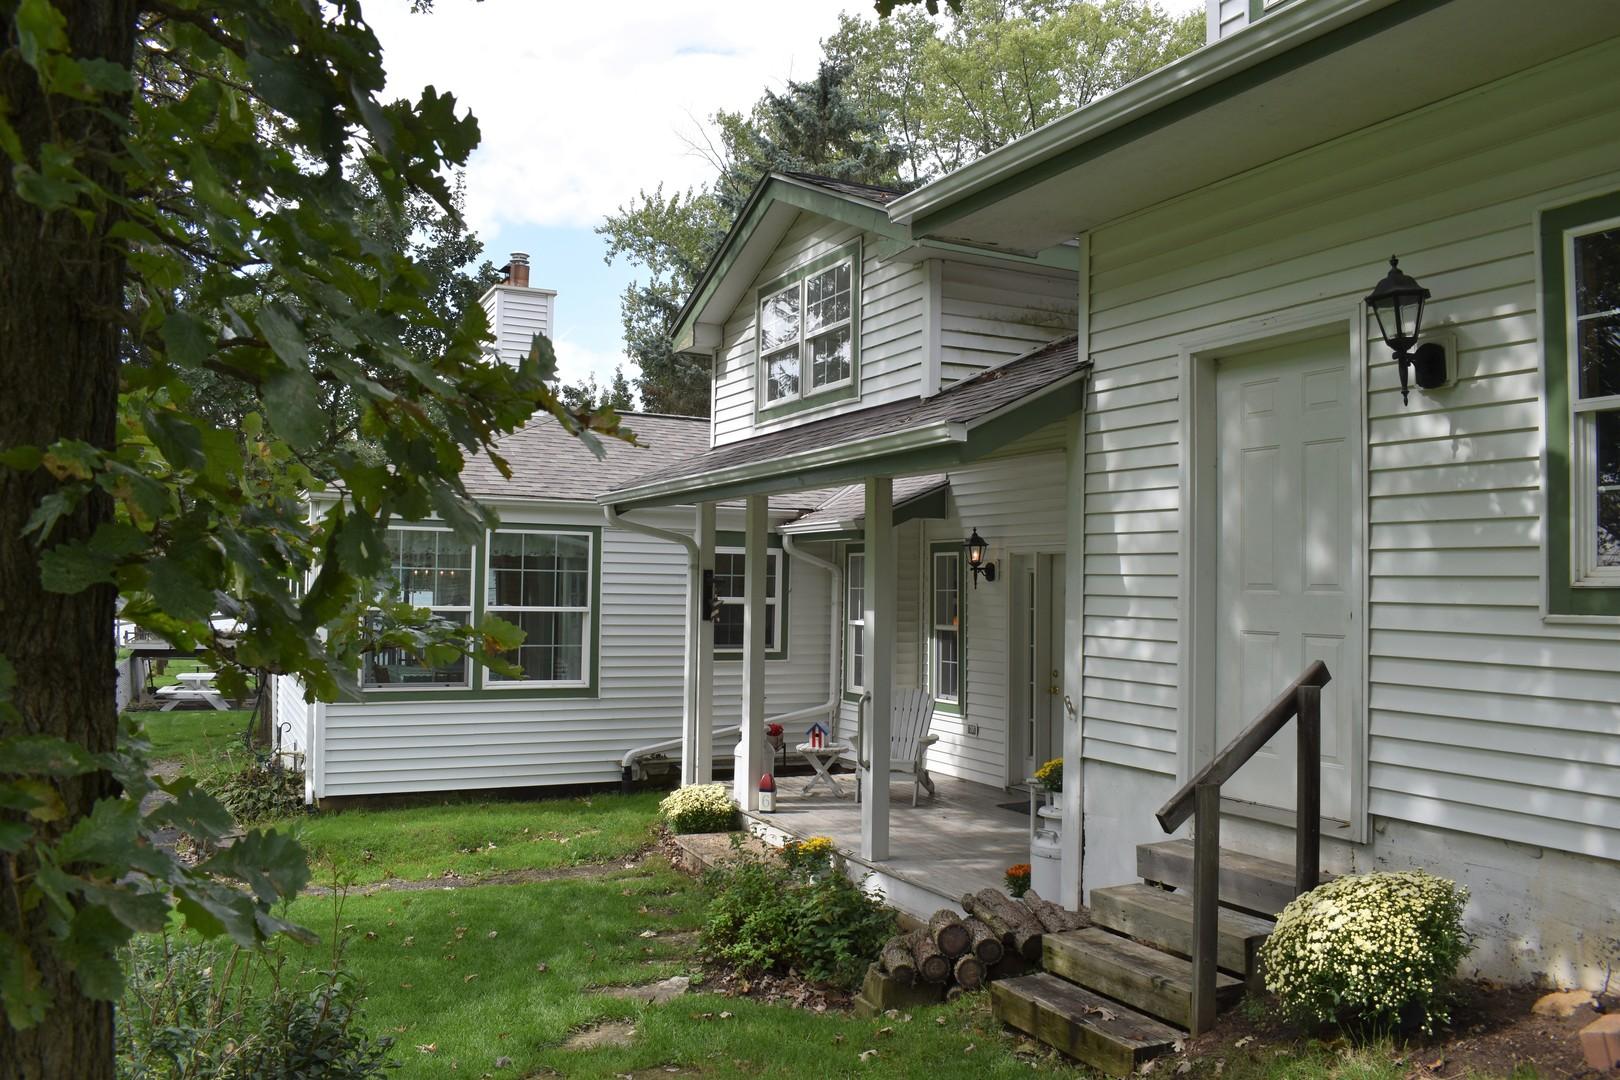 4501 East Lake Shore, Wonder Lake, Illinois, 60097